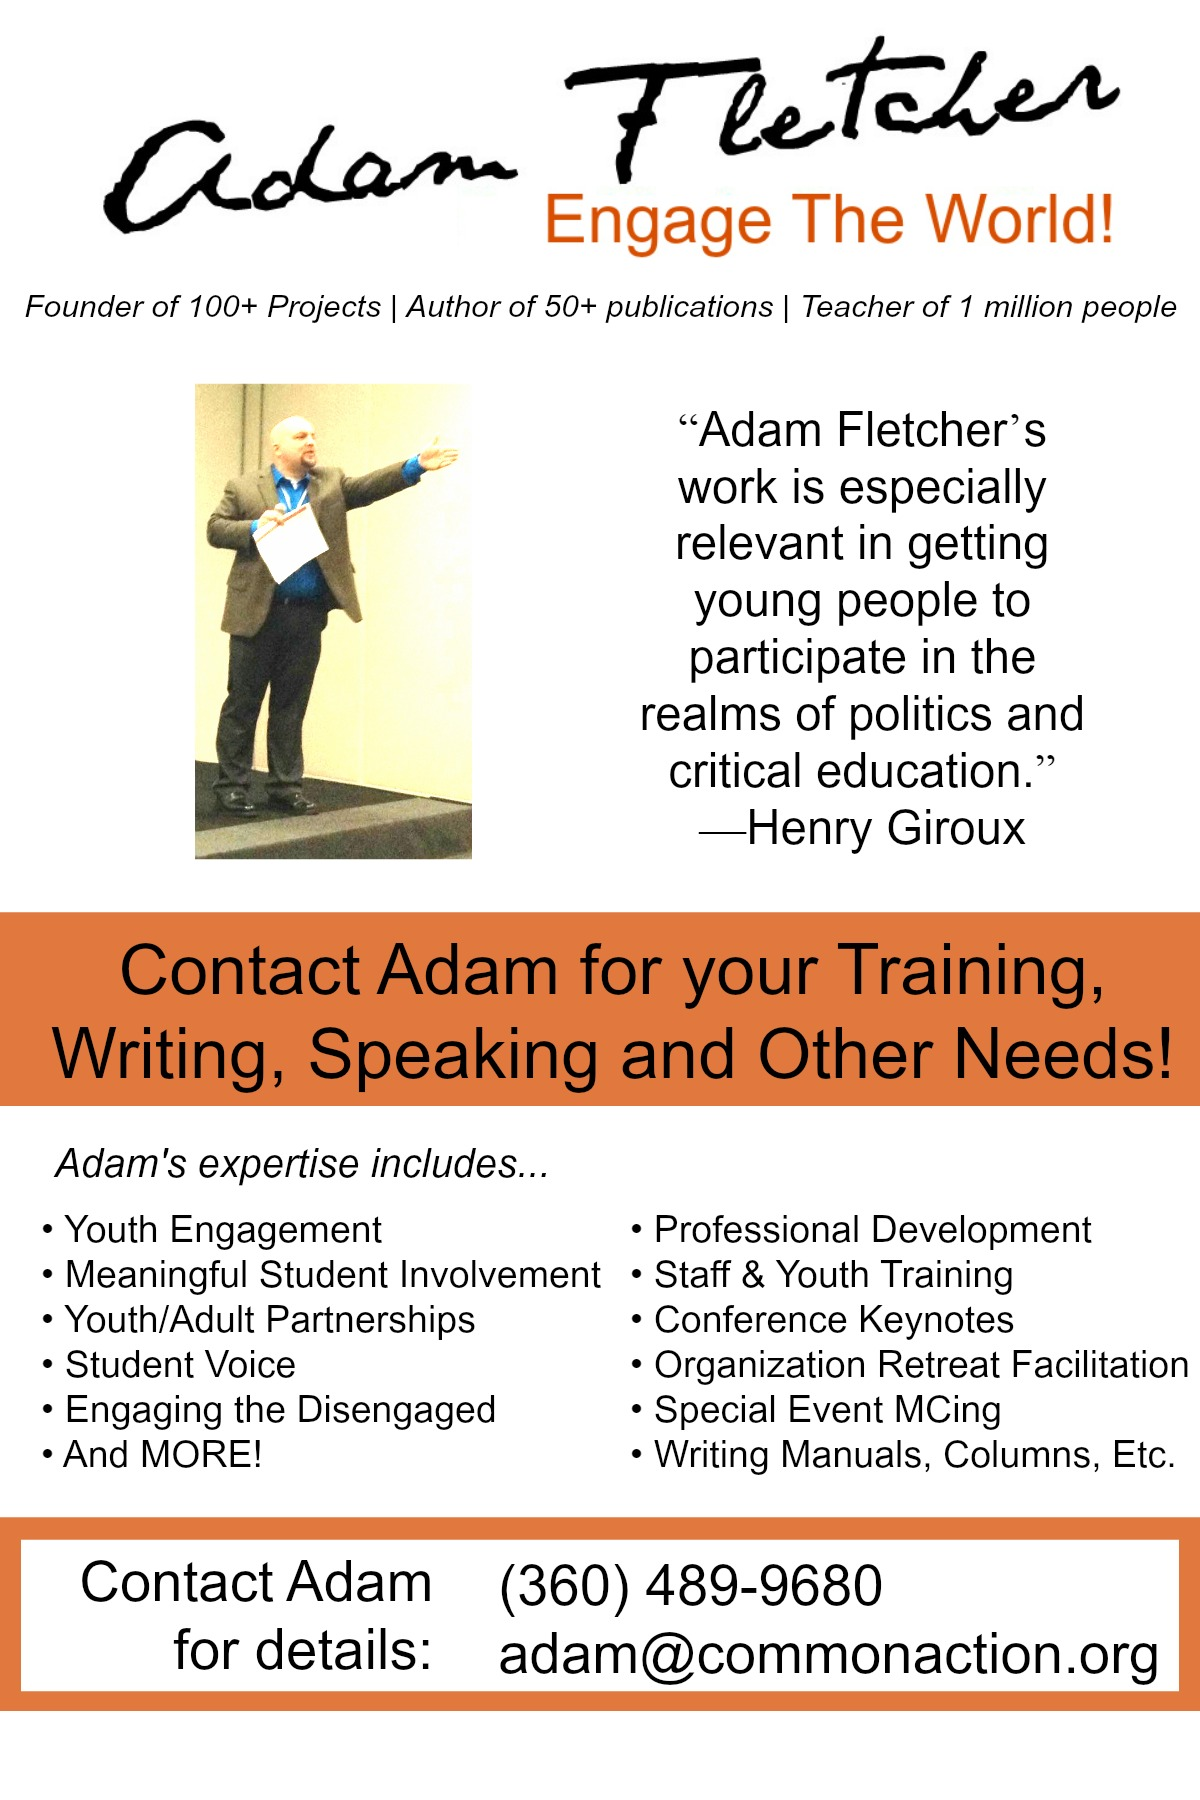 Adam Fletcher's 12/2014 Promo Flyer. Adam Fletcher's 12/2014 Promo Flyers. For more info visit https://adamfletcher.net/contact-us